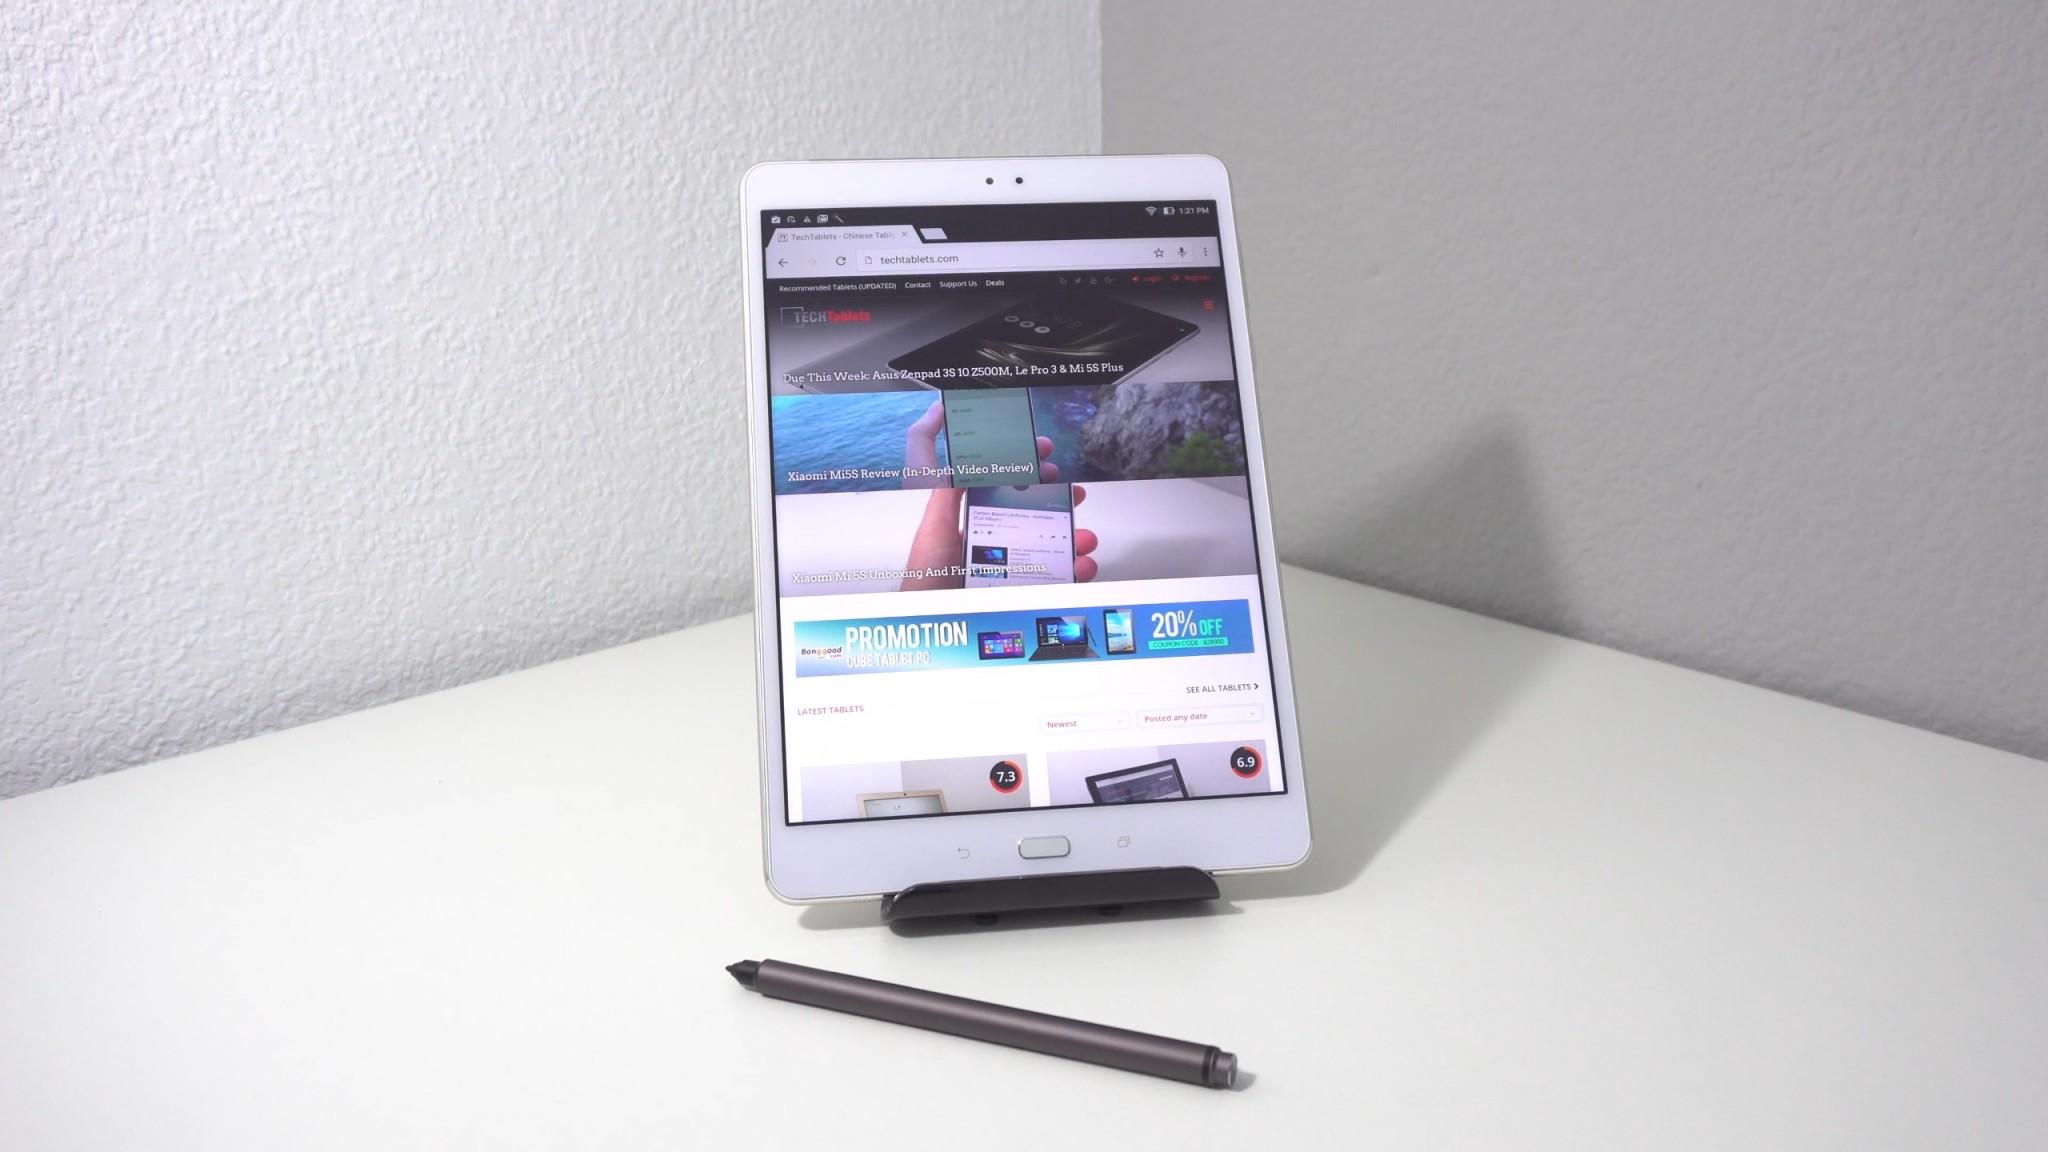 Asus Zenpad 3s 10 Techtablets